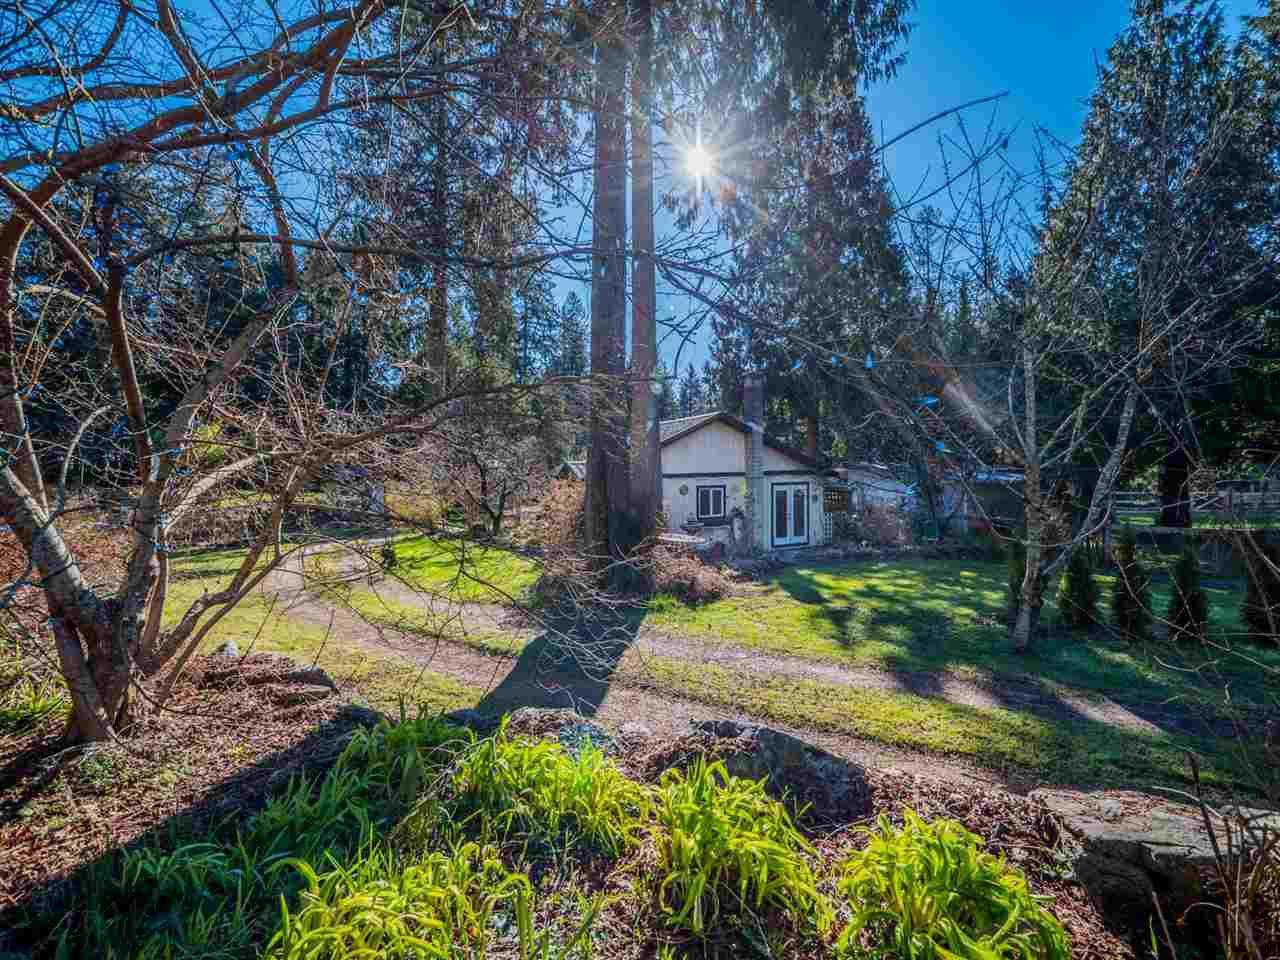 Photo 17: Photos: 3592 BEACH Avenue: Roberts Creek House for sale (Sunshine Coast)  : MLS®# R2244747